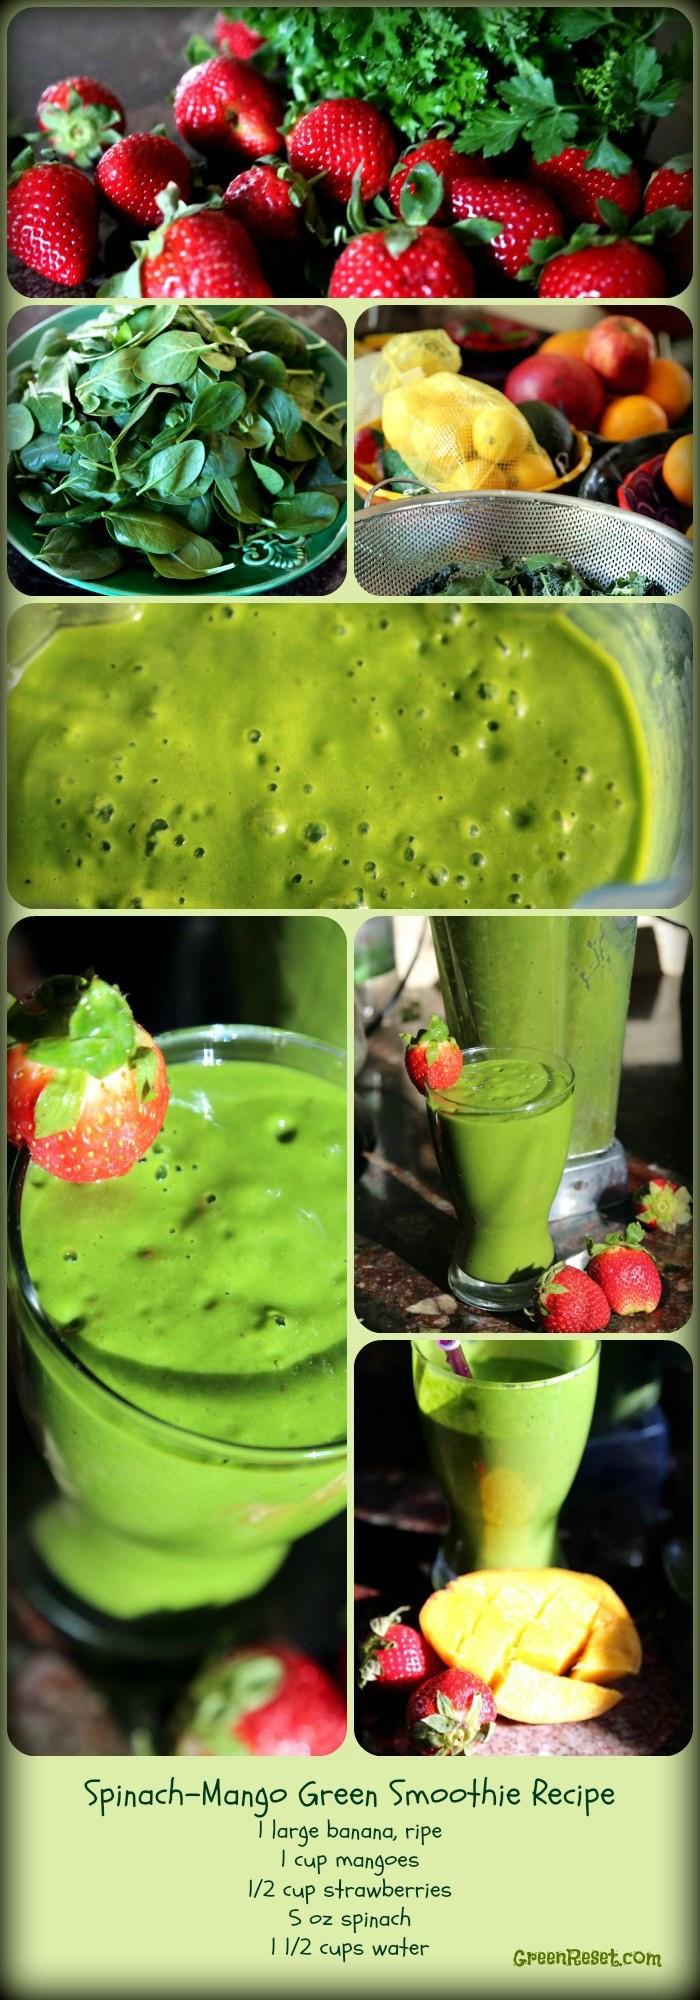 Breakfast Smoothie Recipes  9 Breakfast Smoothies Plus 3 More Super Healthy Breakfast